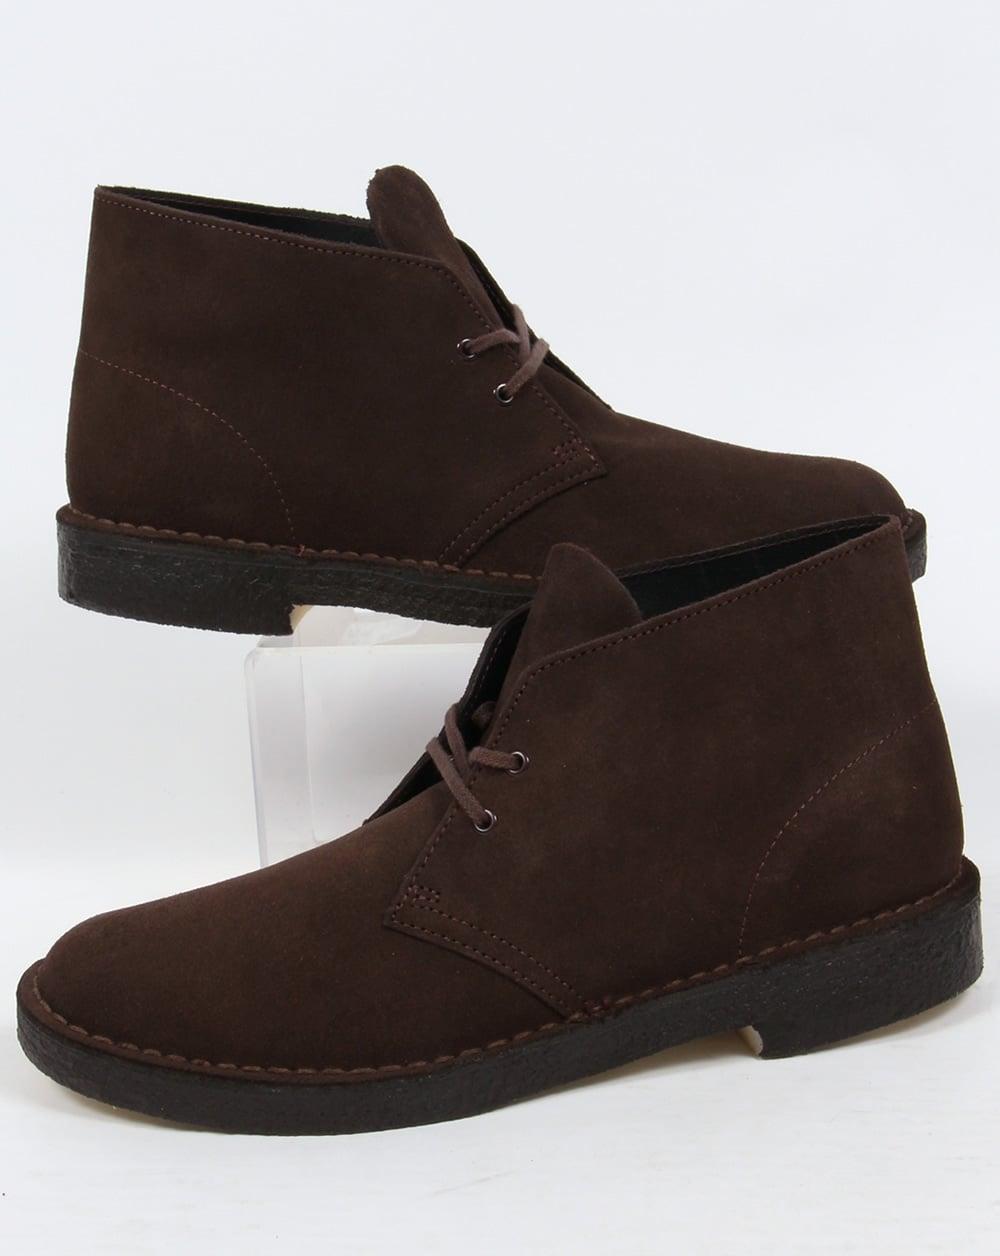 clarks originals desert boot in suede brown. Black Bedroom Furniture Sets. Home Design Ideas